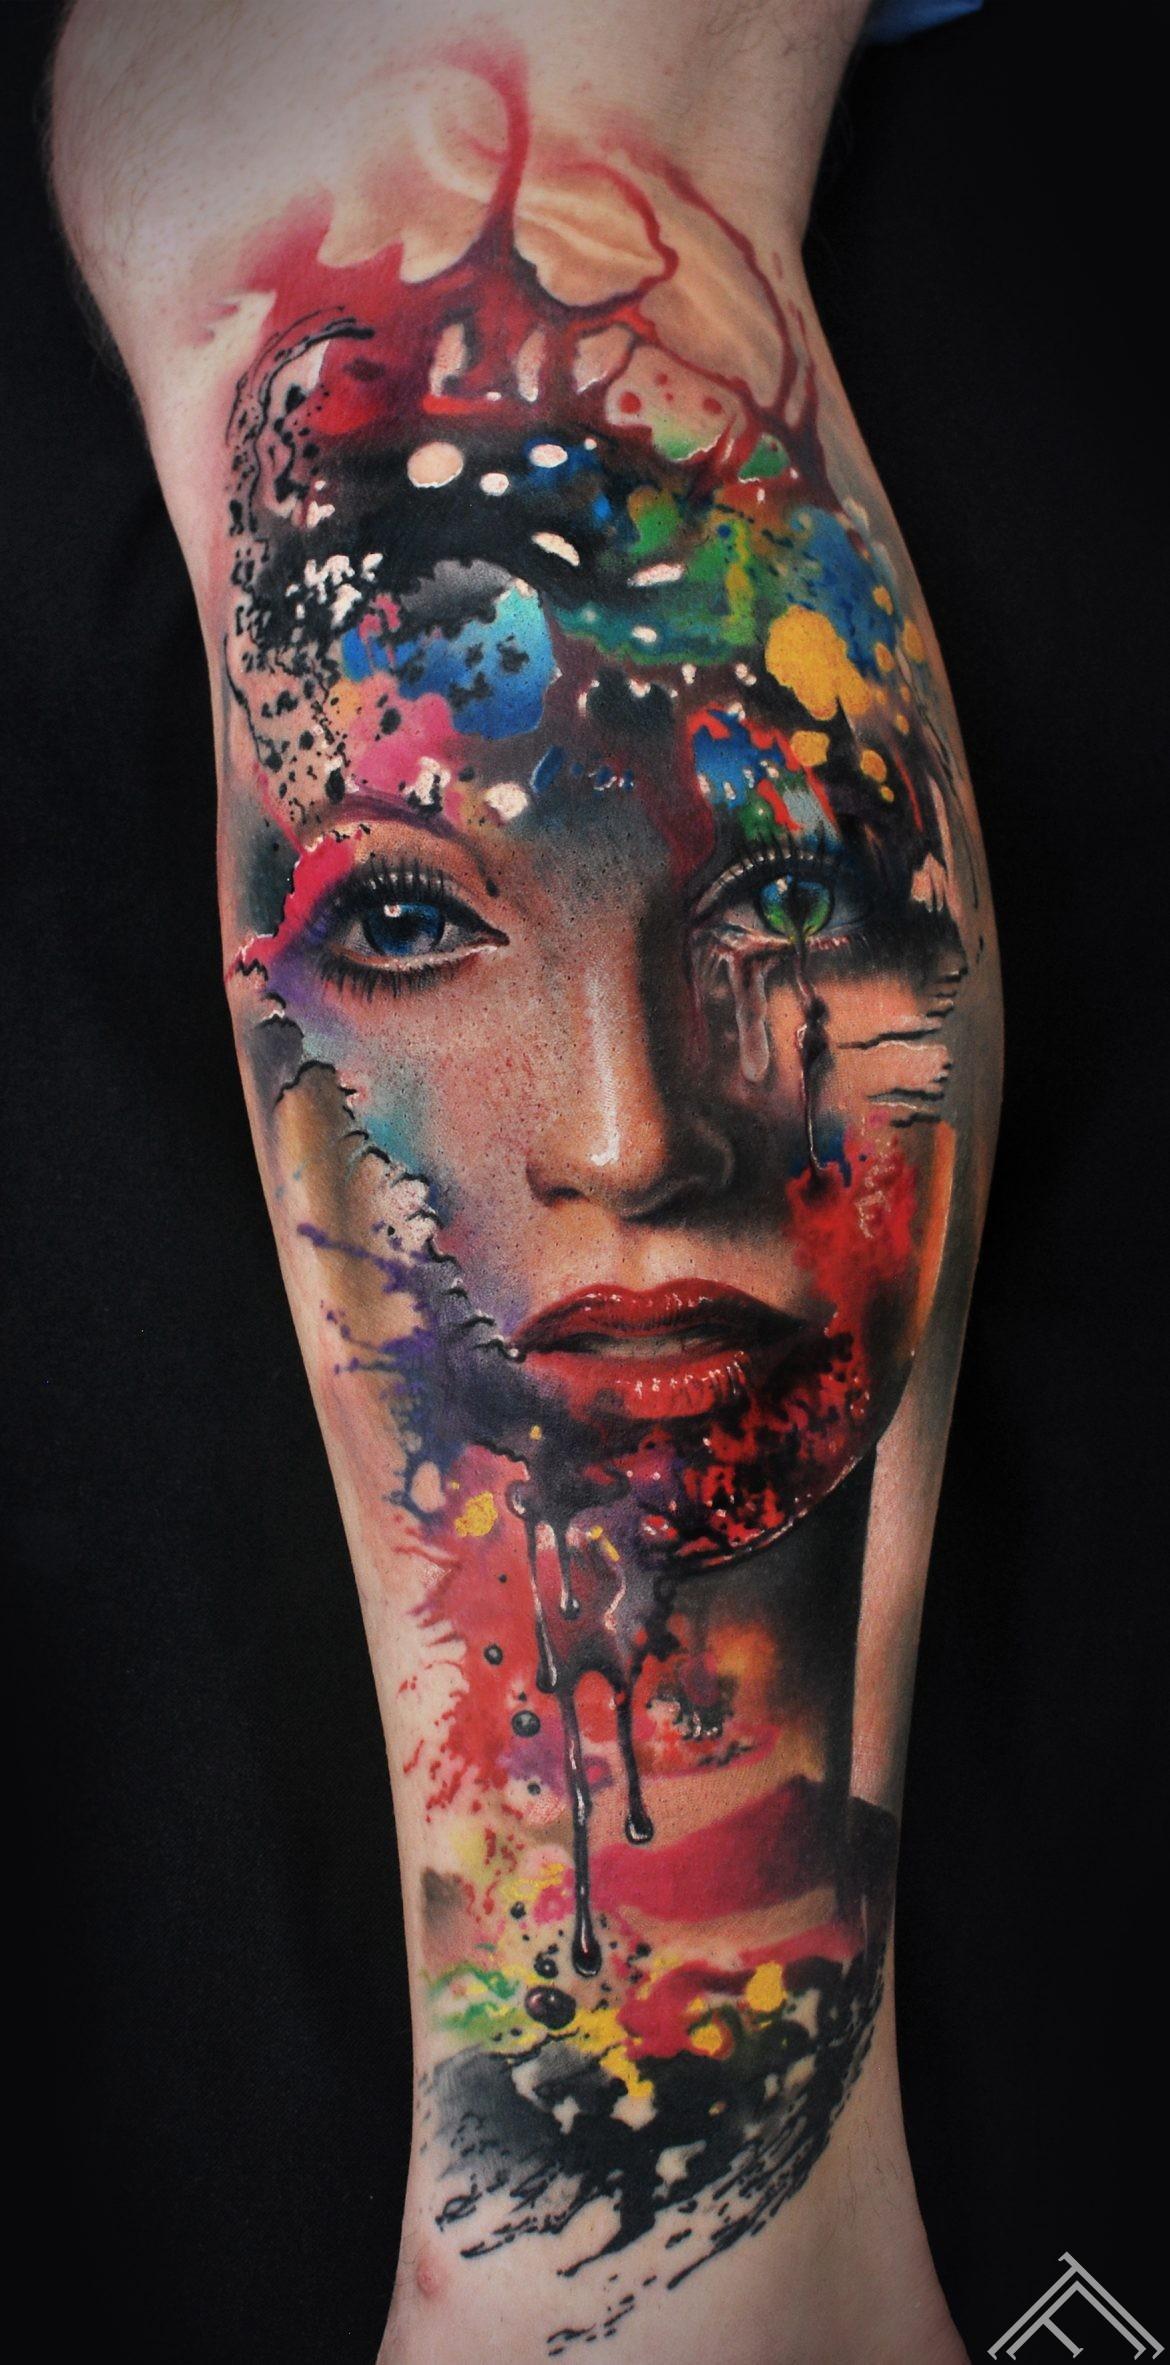 woman-color-colour-krasas-sieviete-portrait-portrets-tattoo-tetovejums-ink-tattoofrequency-riga-marispavlo-normalsize